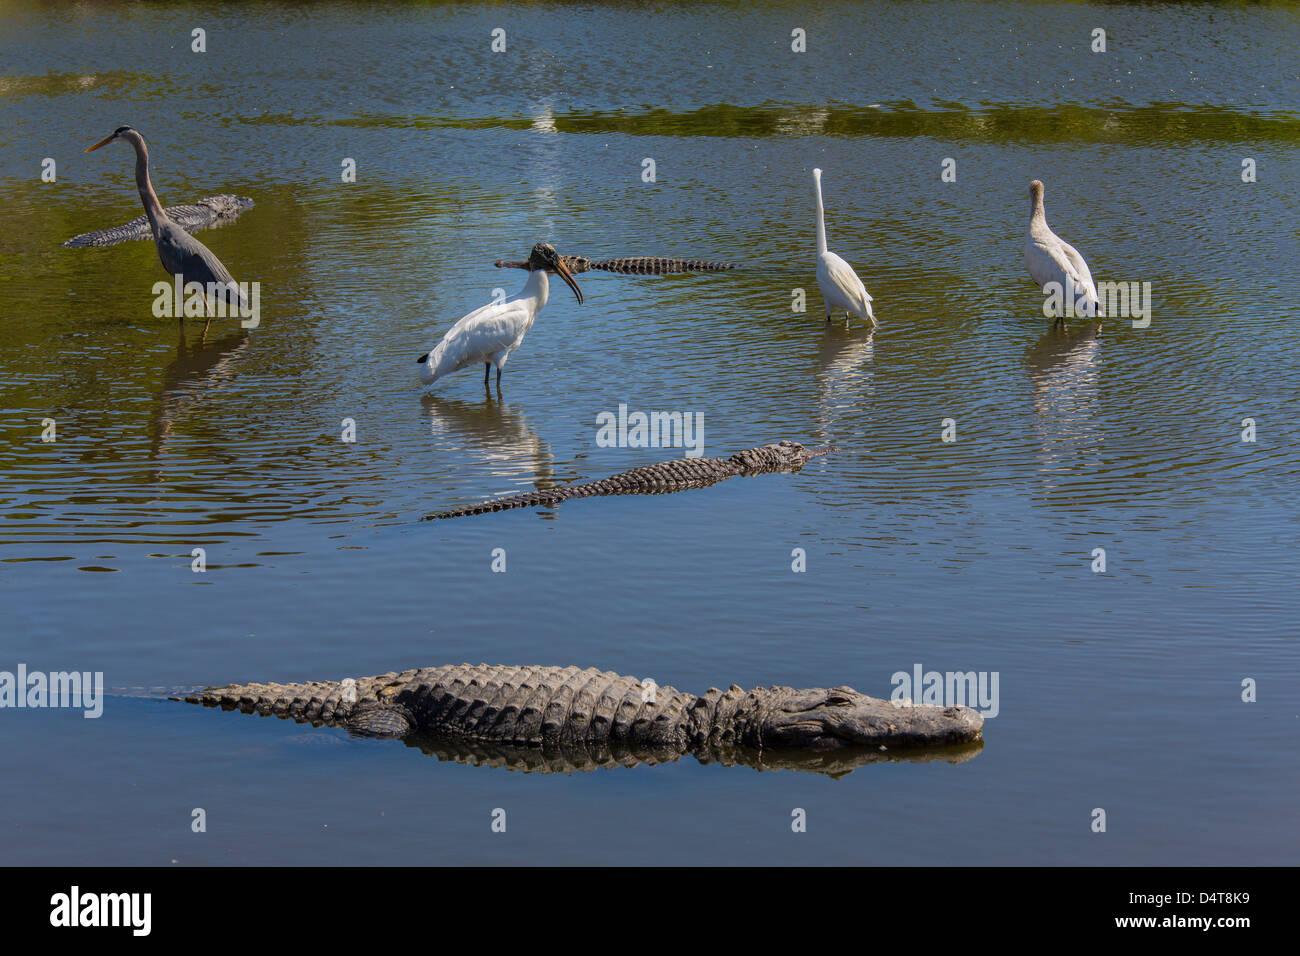 Alligaors and birds together at Gatorland in Orlando Florida - Stock Image